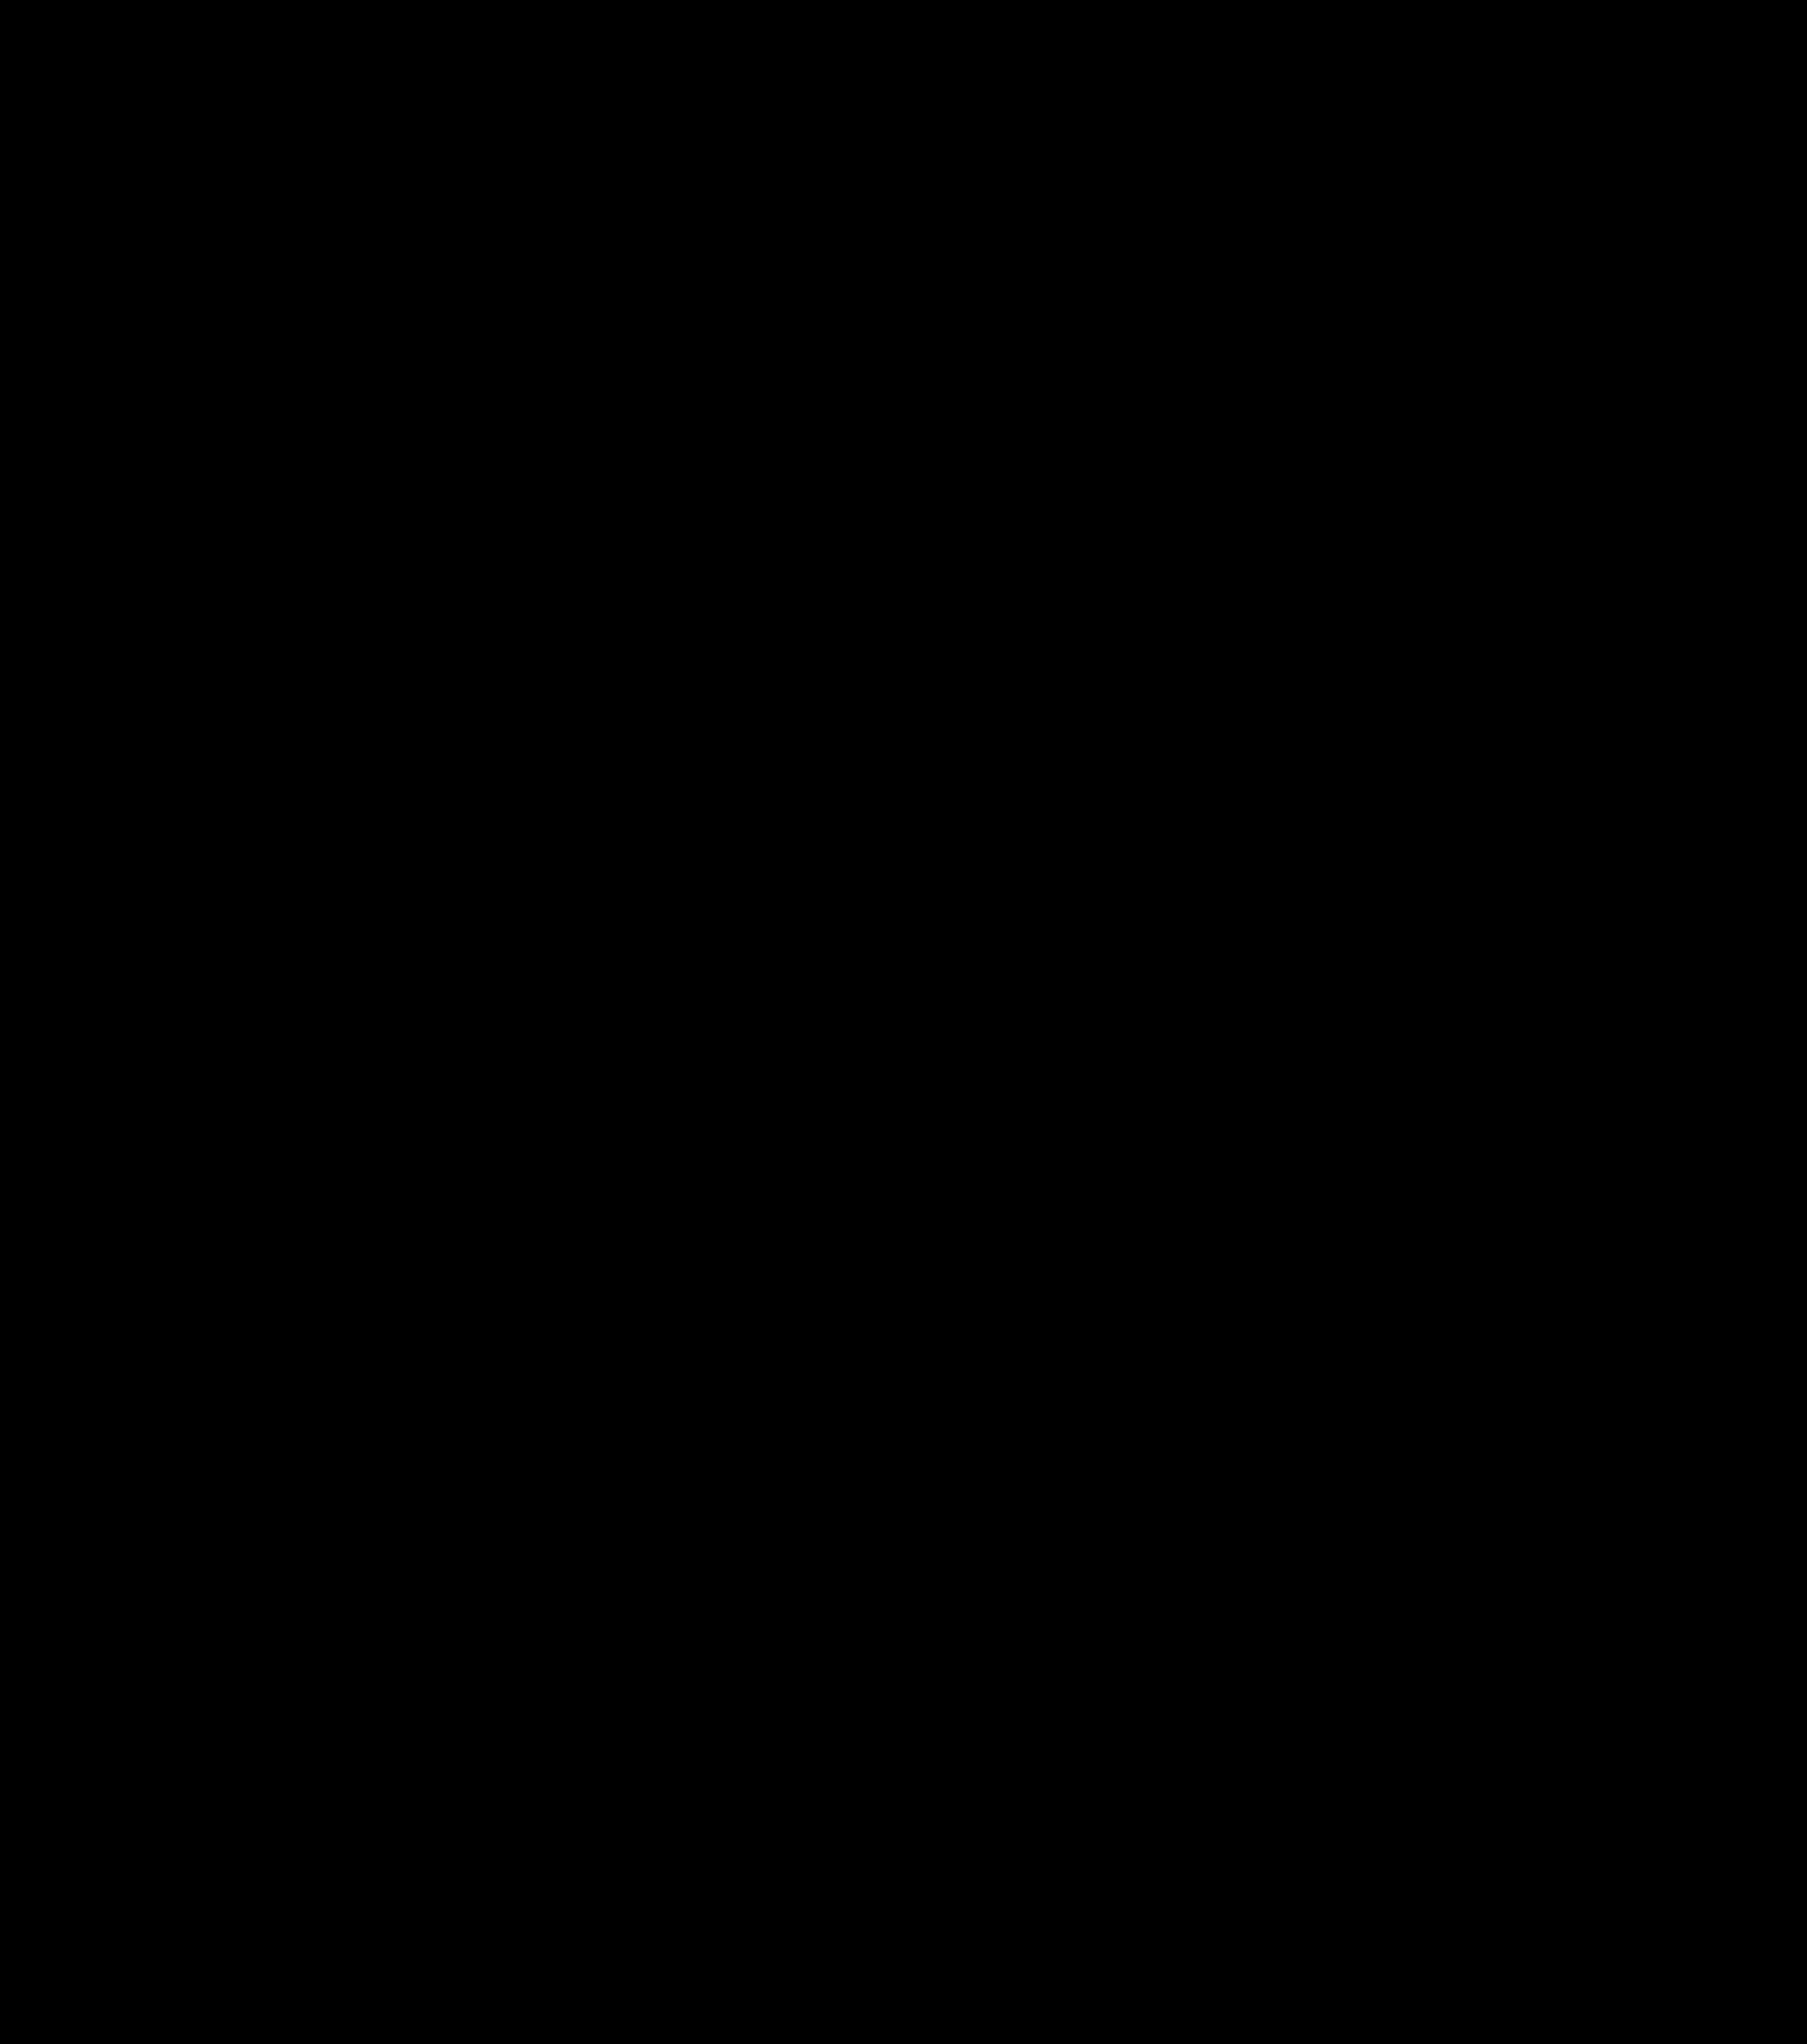 2005x2268 Clipart